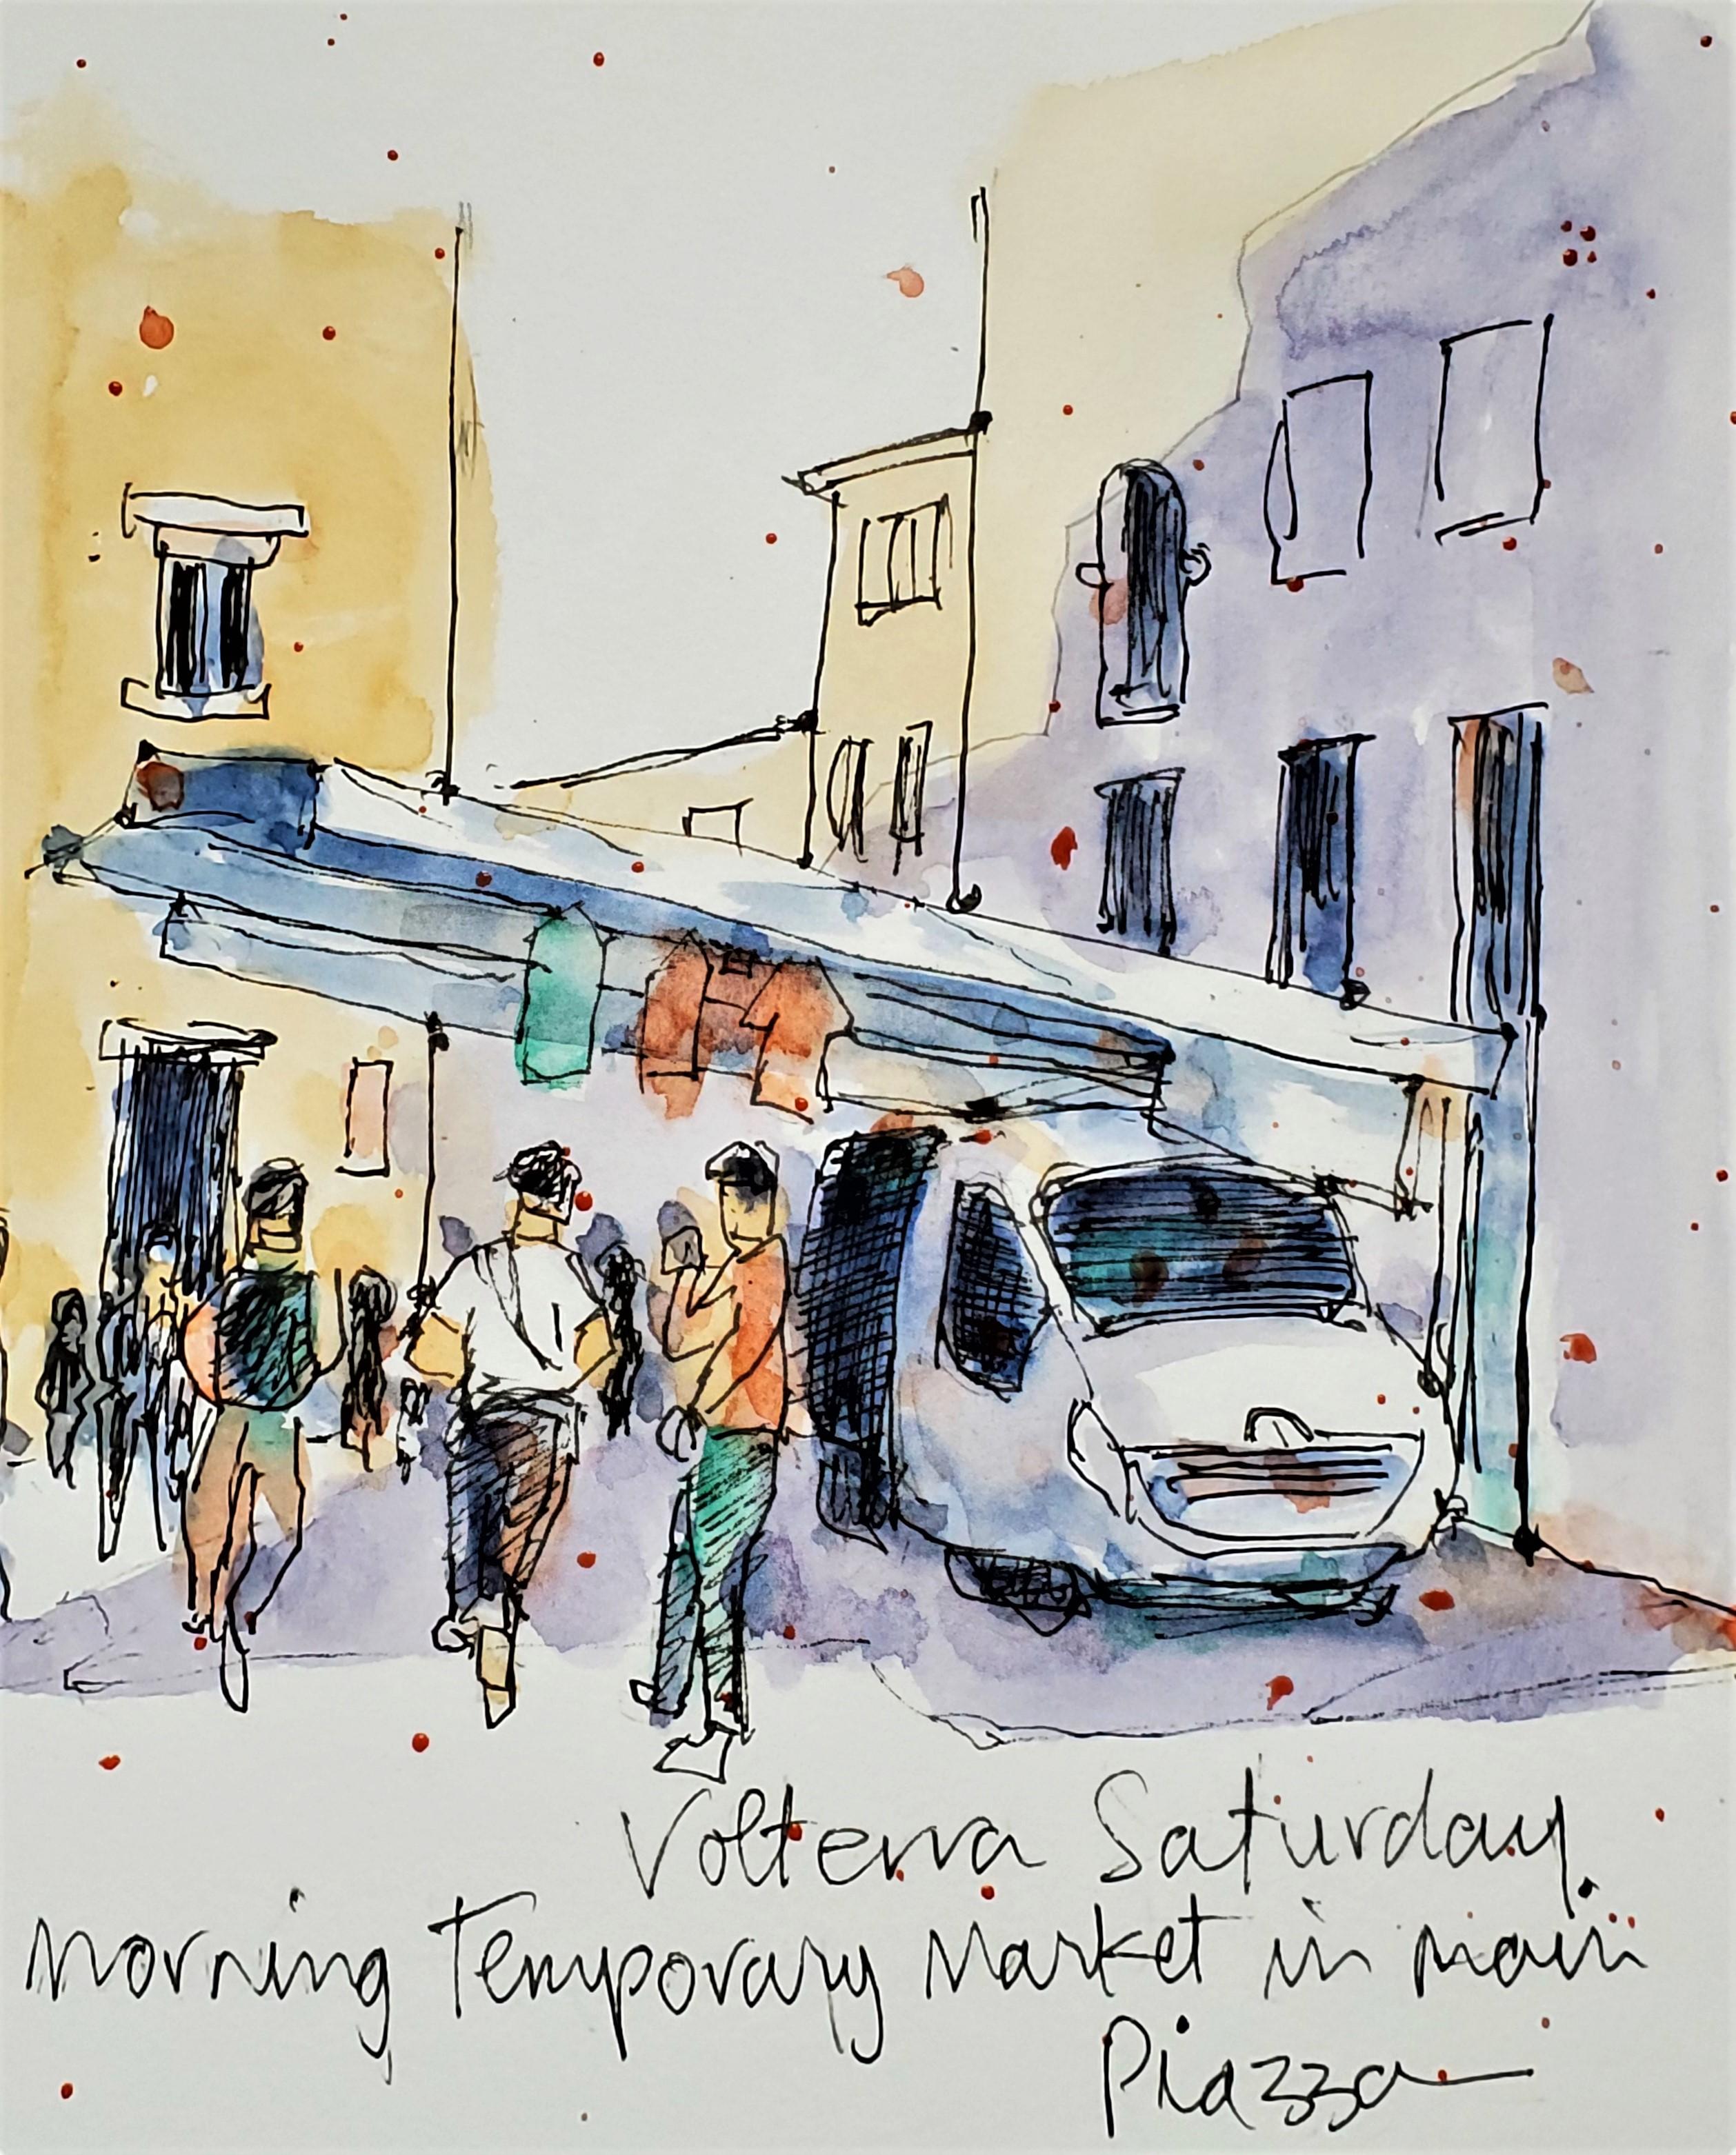 Volterra Saturday Market